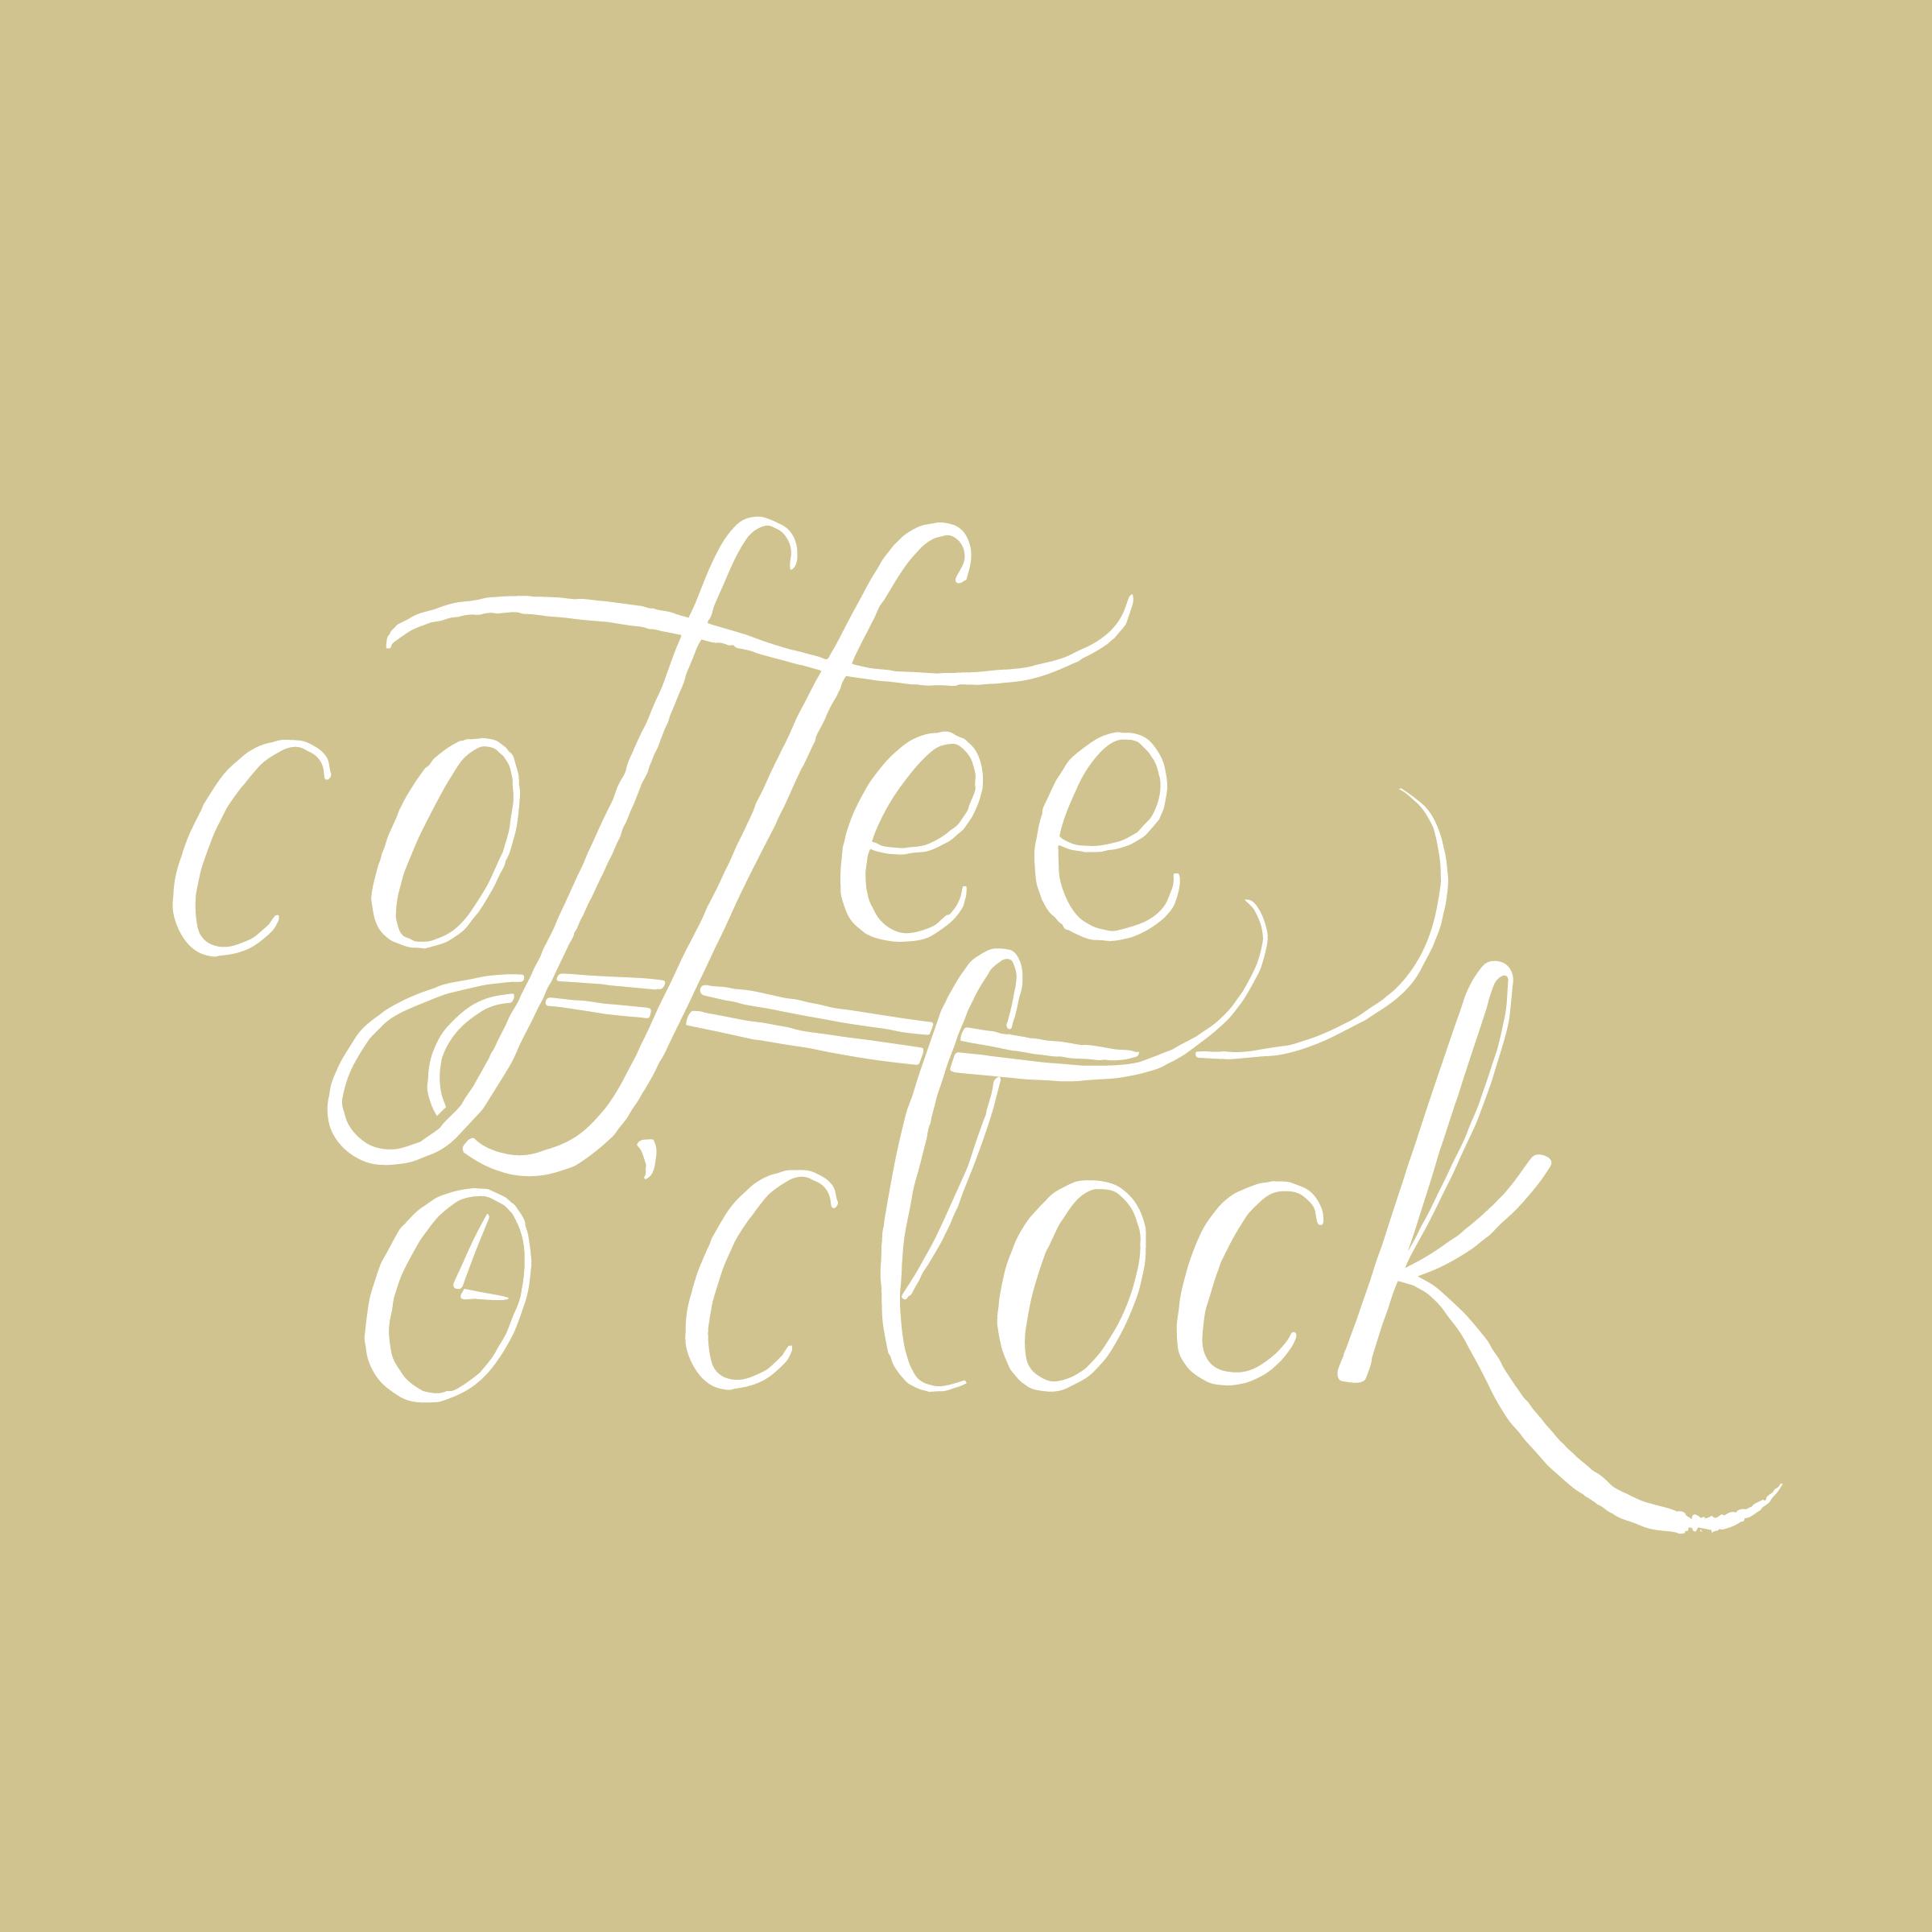 Coffee OClock - andreacrofts.com.jpg